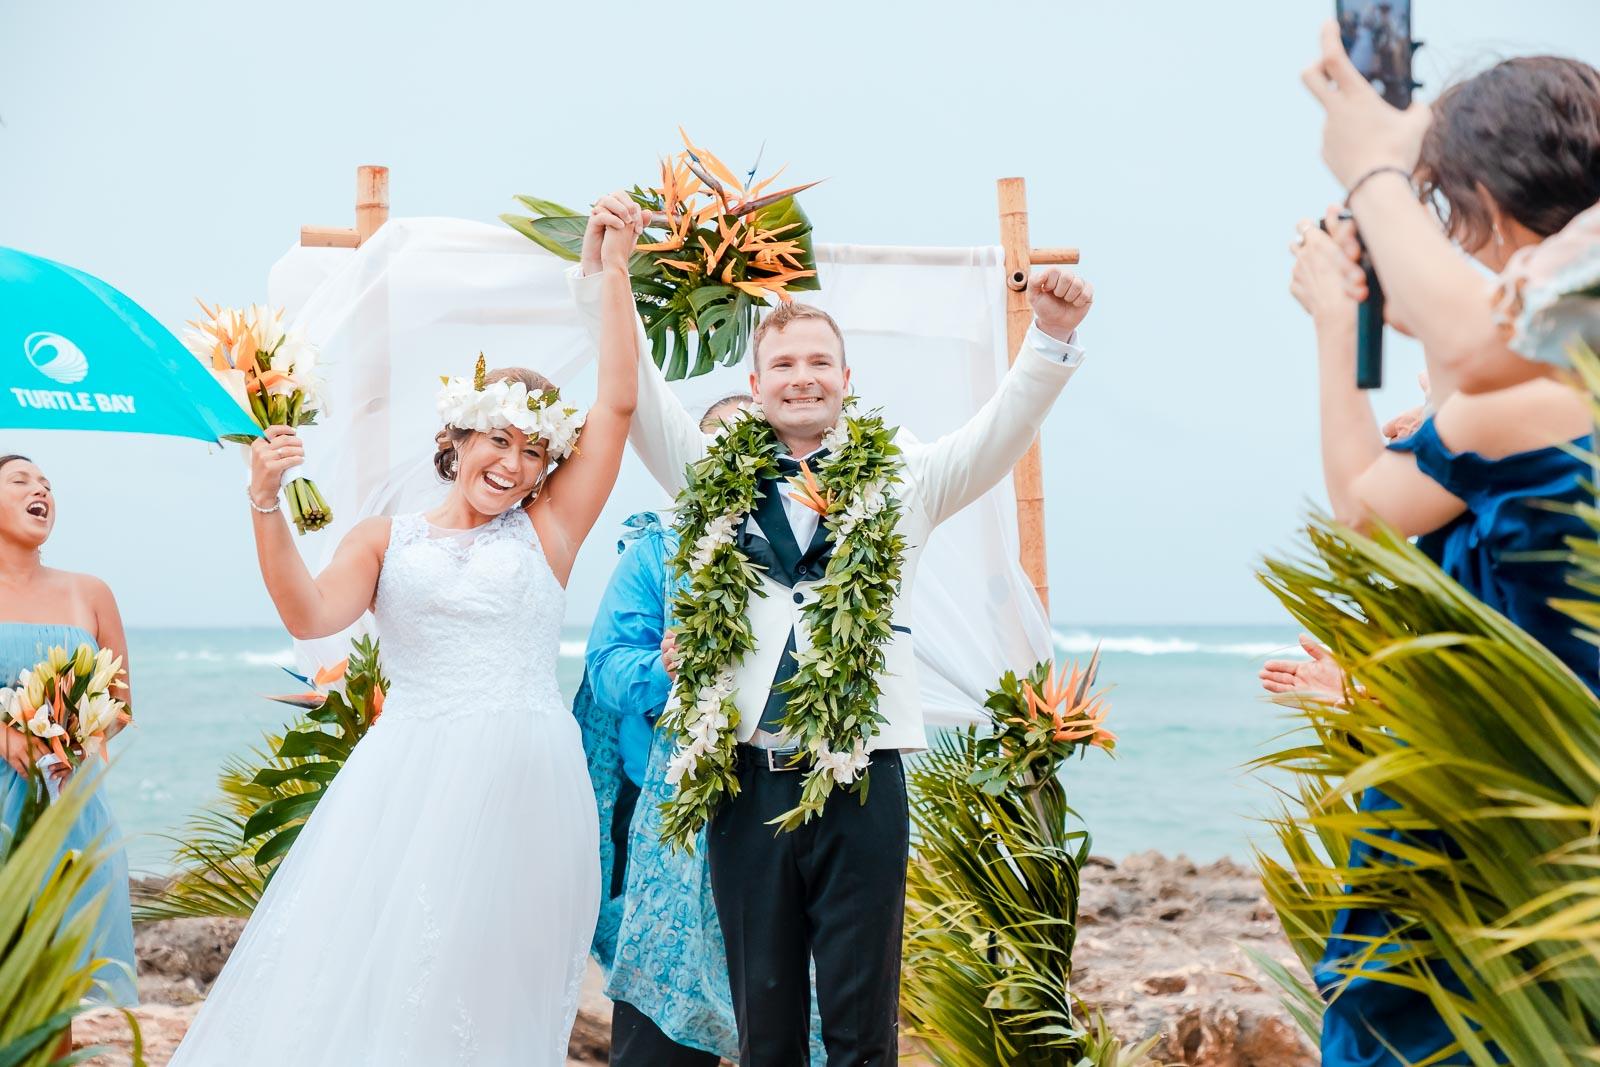 bride groom wedding celebration kiss maui beach